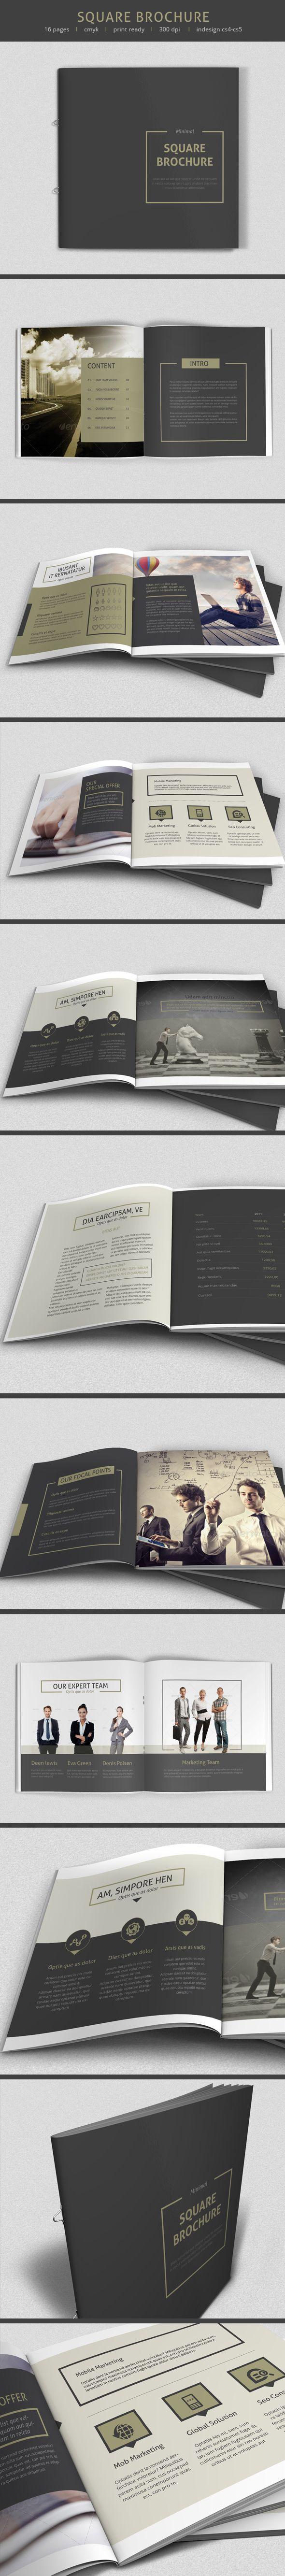 Minimal square Brochure by sz 81, via Behance